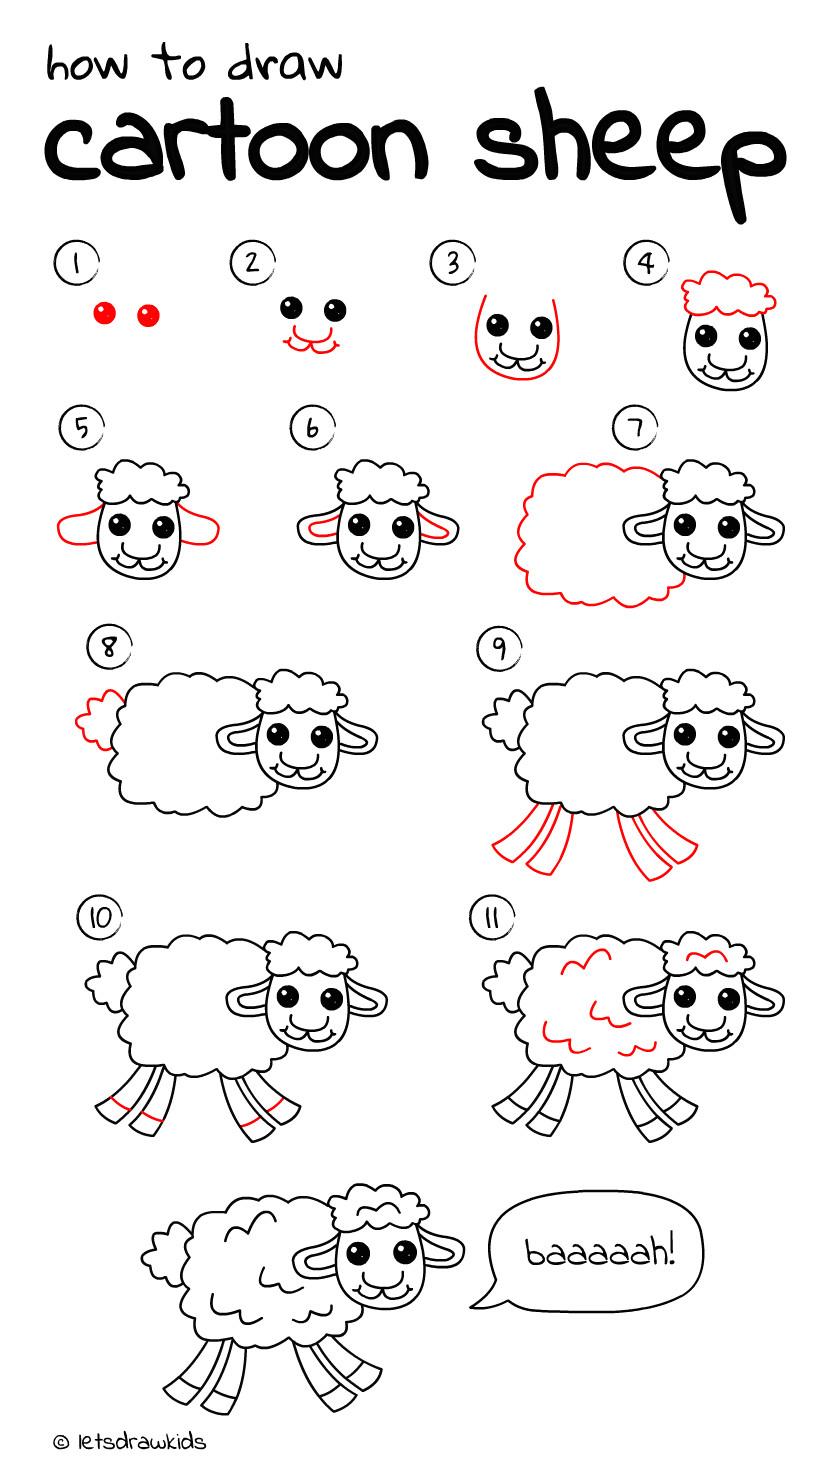 easy drawings cartoon drawings animal drawings drawing clipart animal doodles drawing